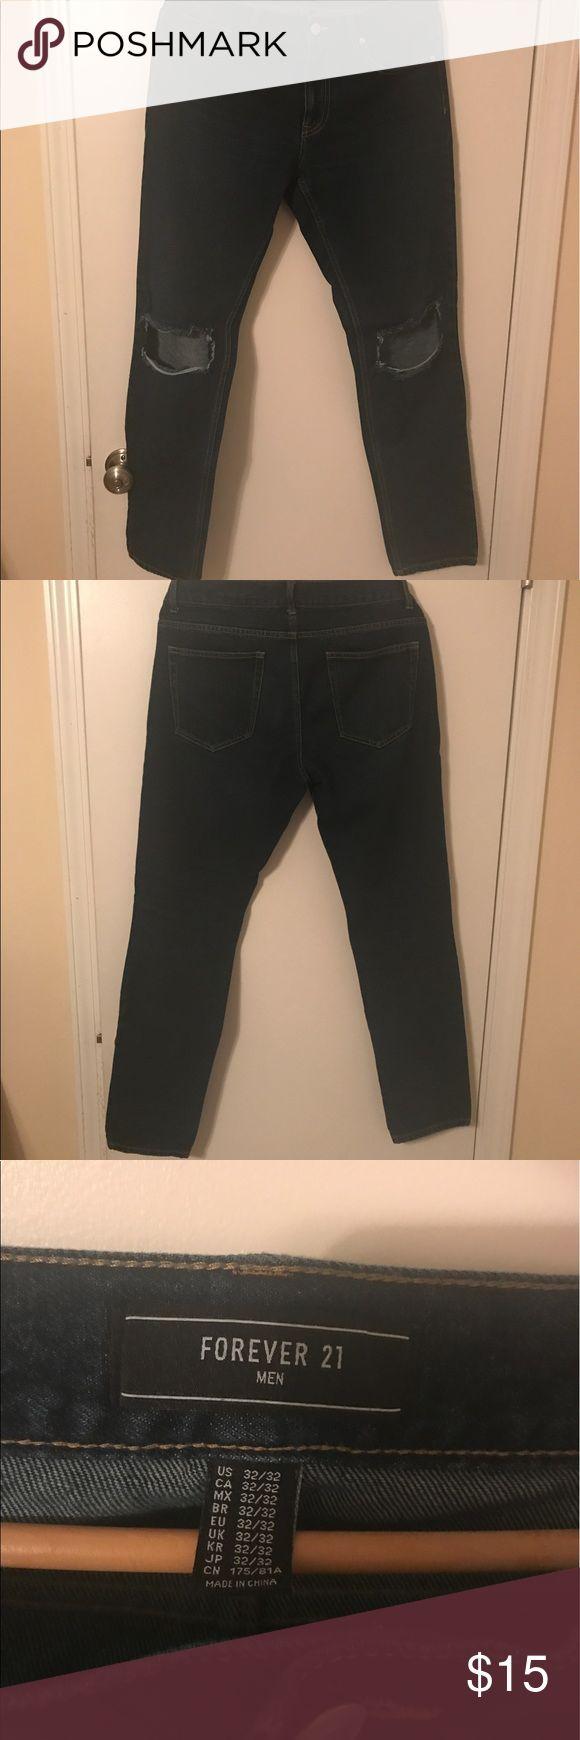 Forever 21 men's distressed skinny jeans Men's Forever 21 distressed skinny jeans. Size 32 but since they're forever 21 they run small. Forever 21 Jeans Skinny